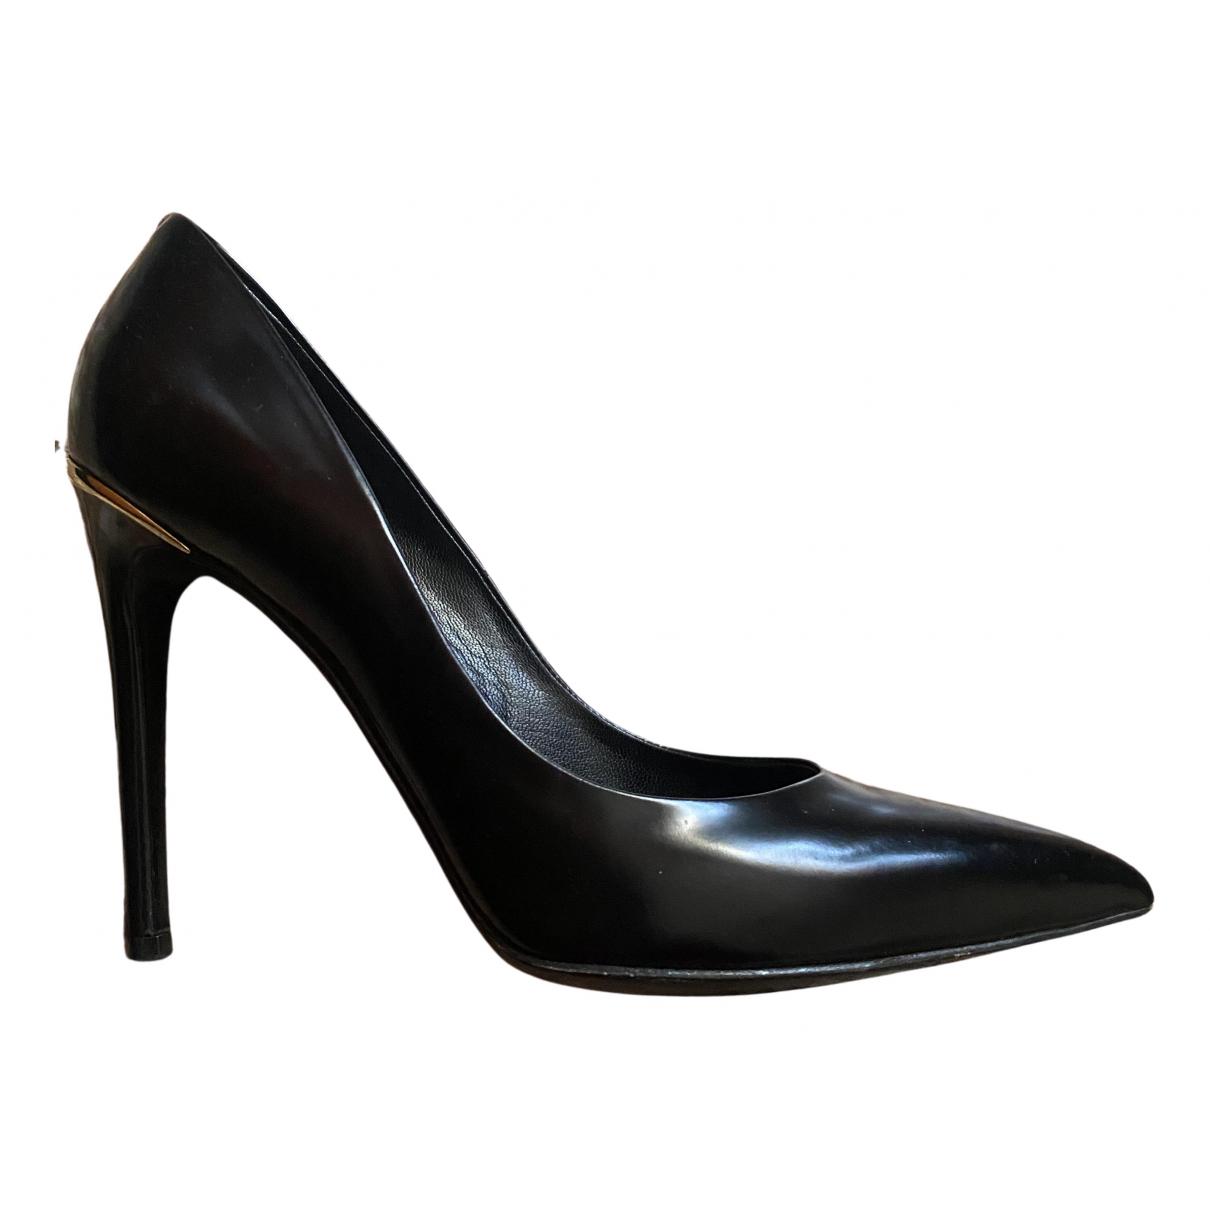 Louis Vuitton N Black Leather Heels for Women 37 EU